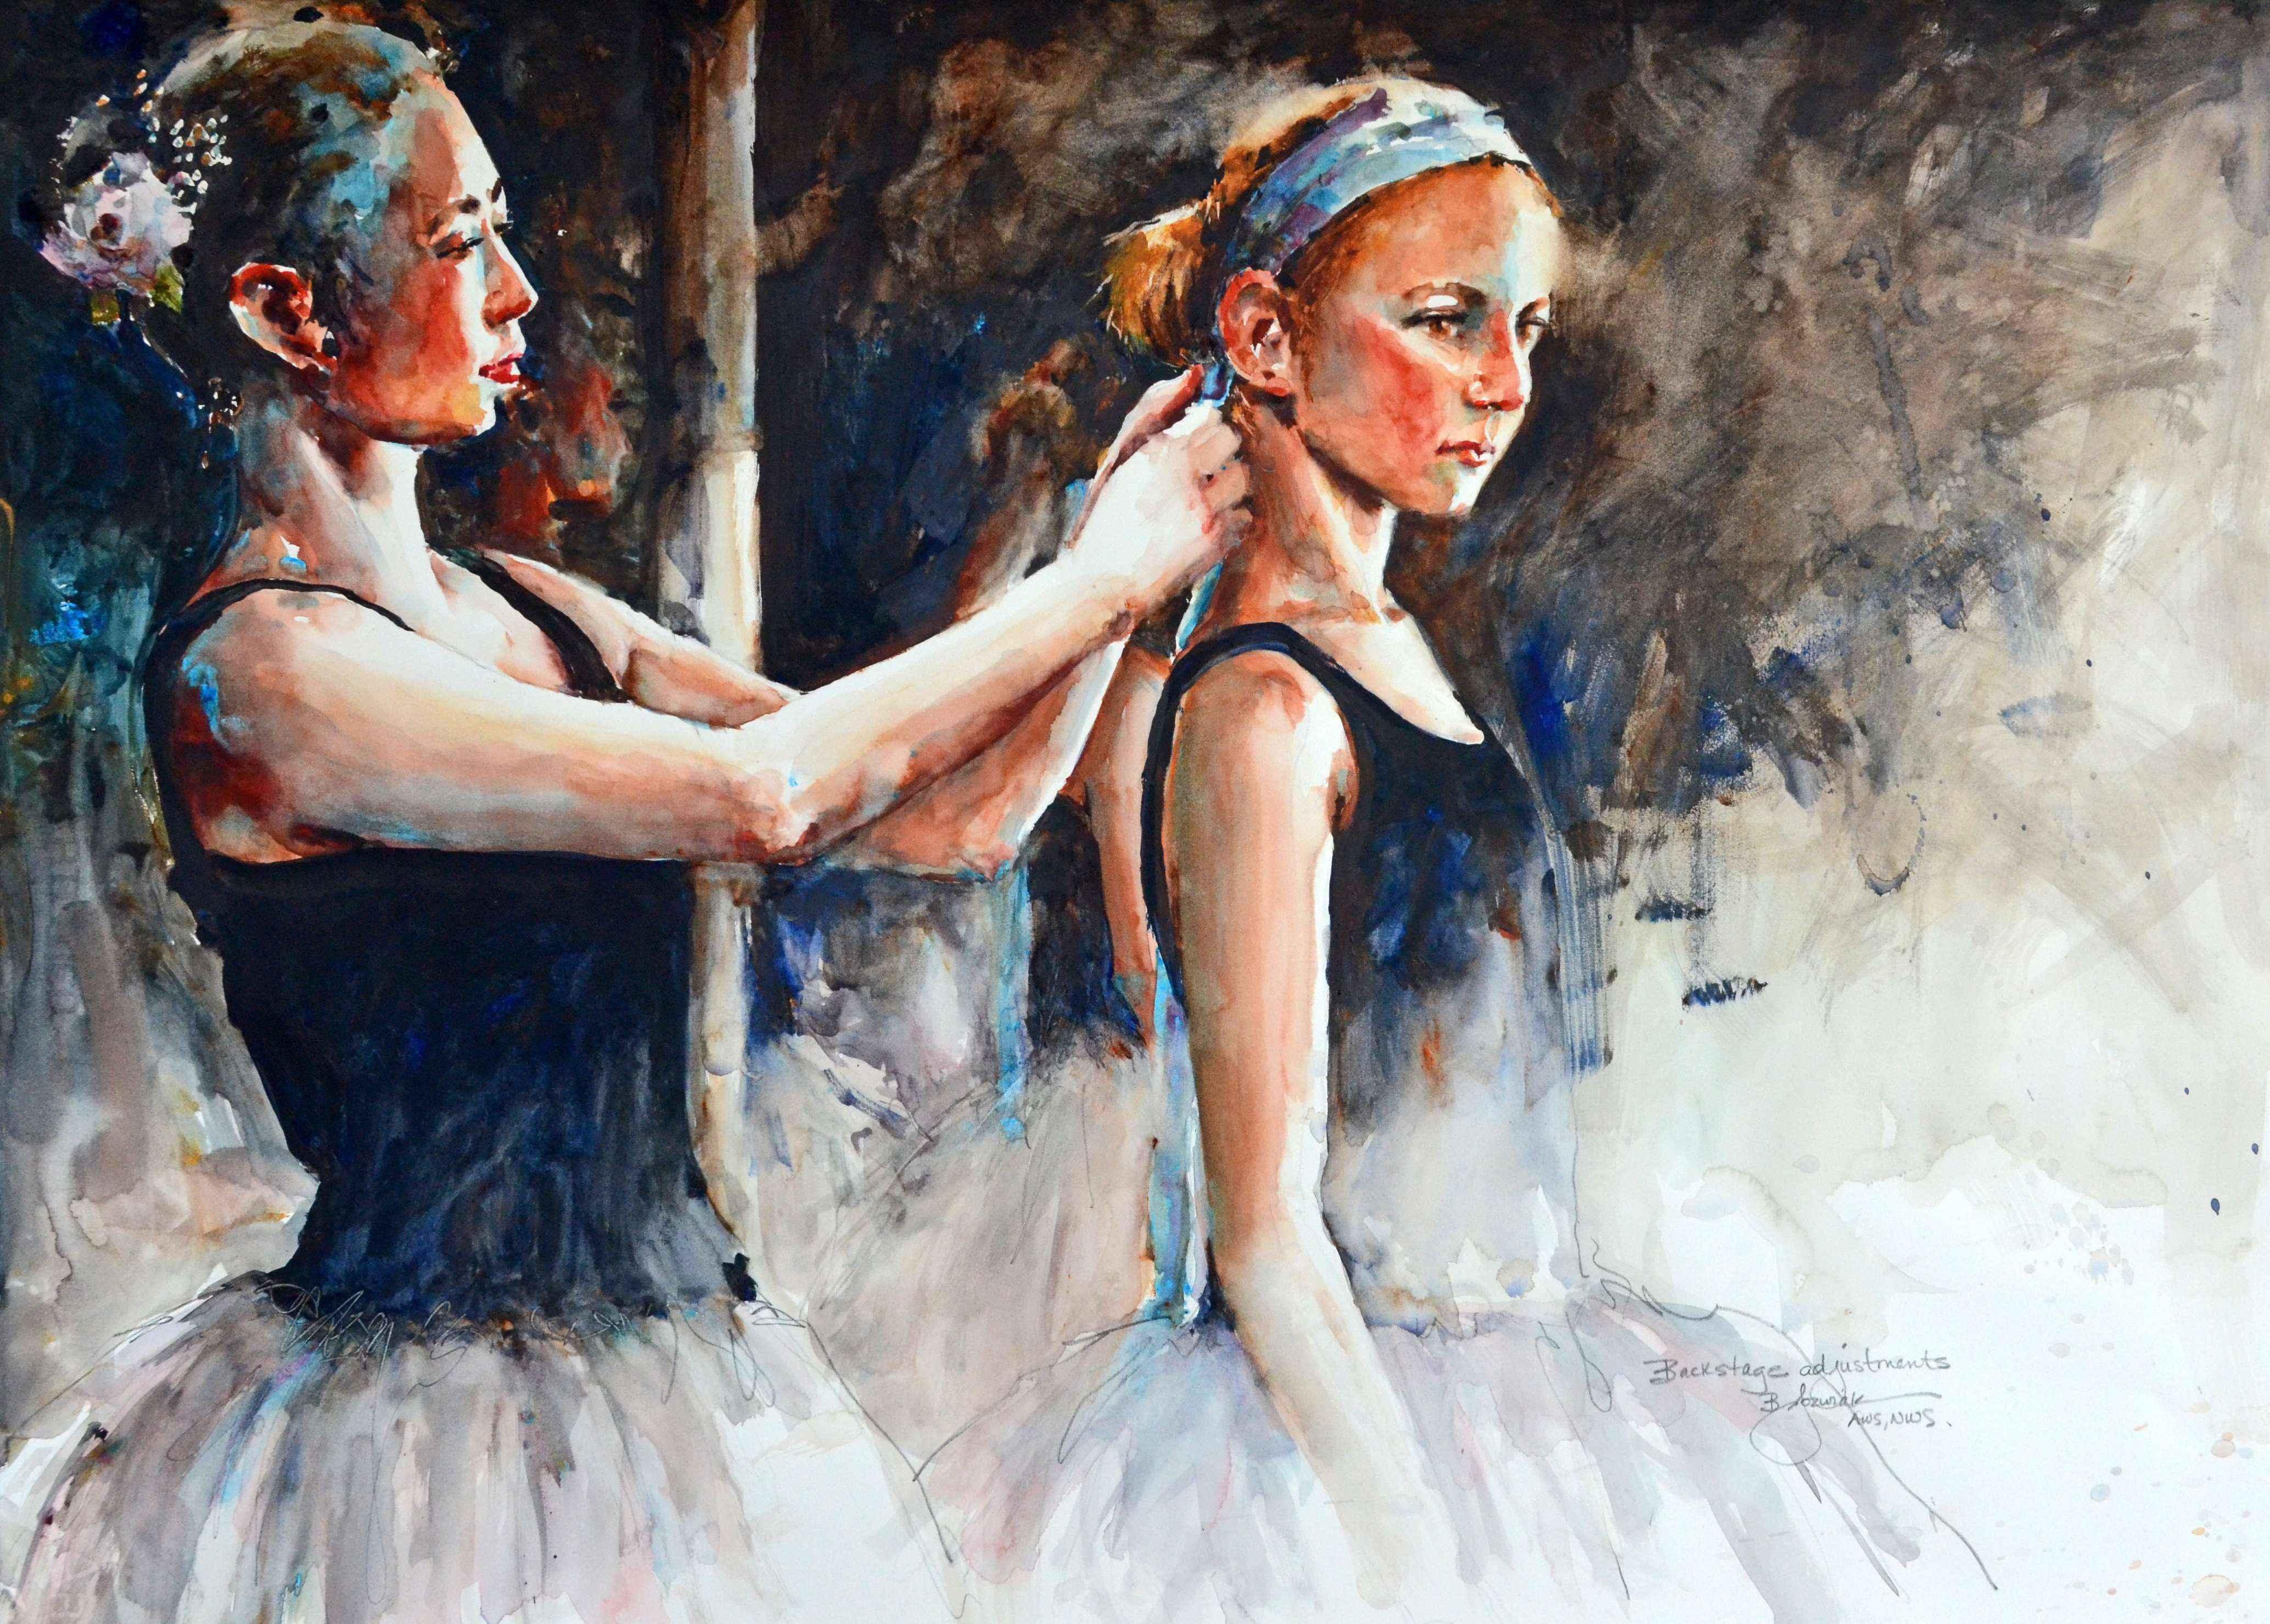 Backstage Adjustments by  Bev Jozwiak - Masterpiece Online